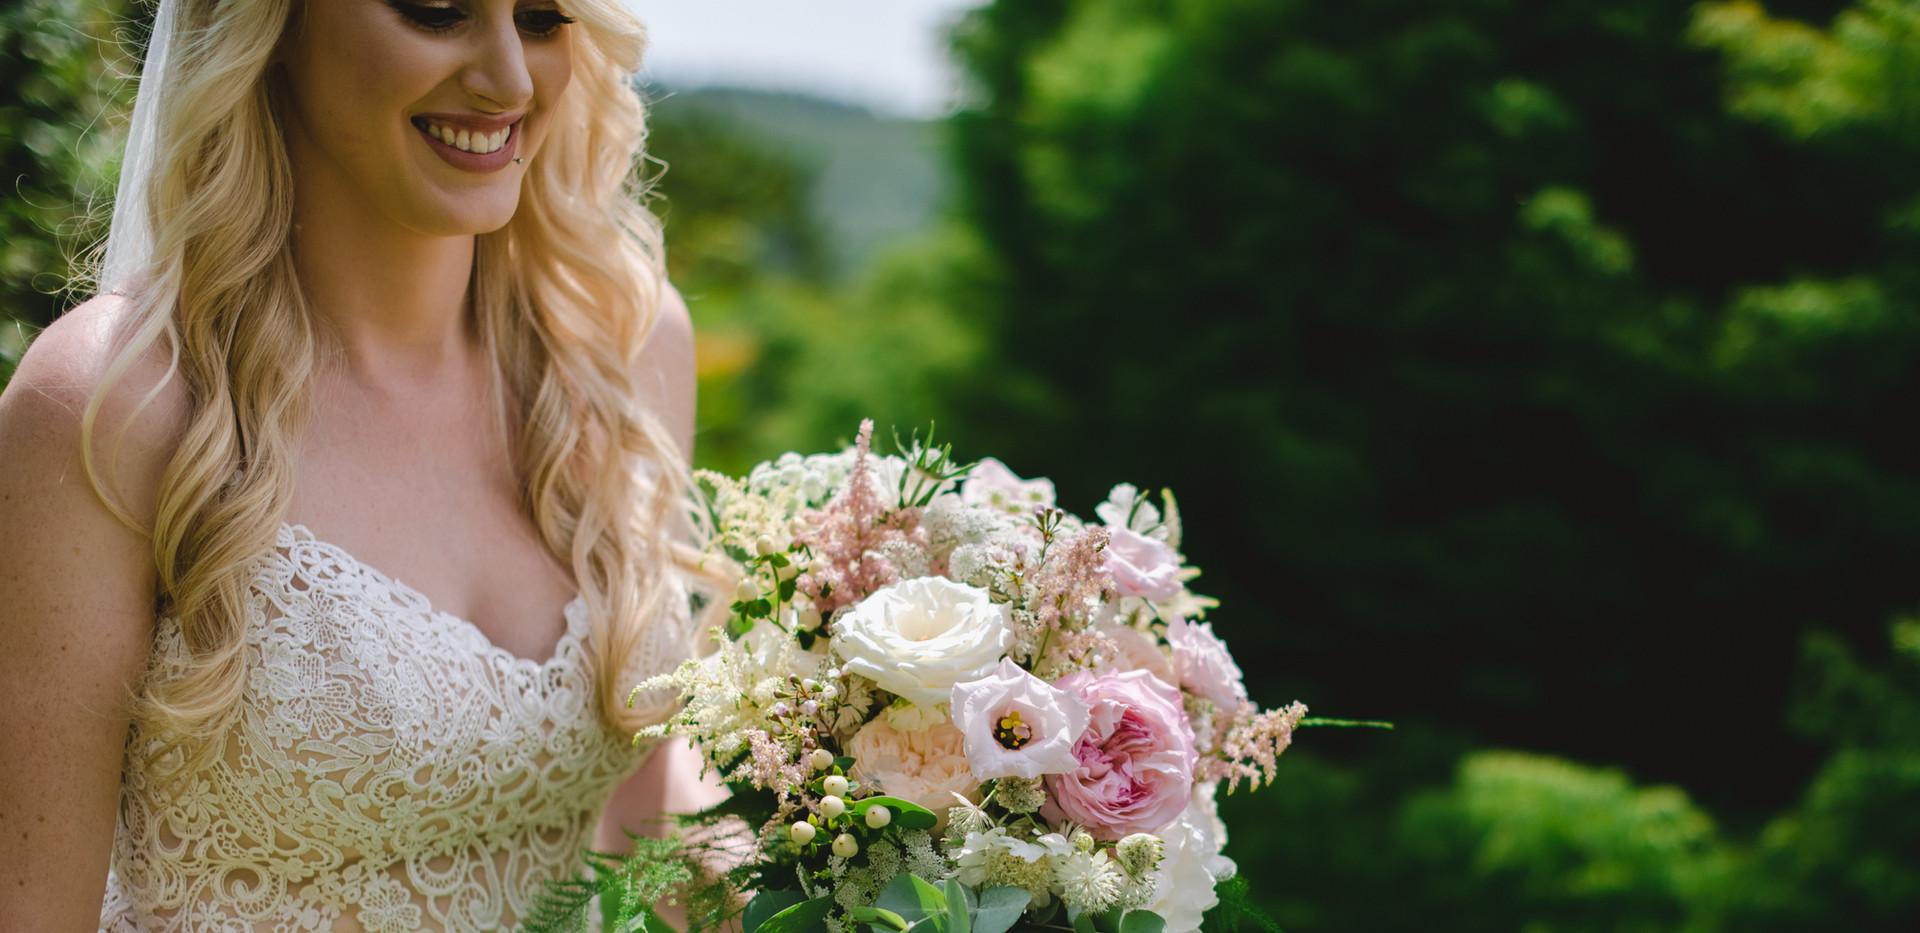 Boho blush bridal bouquet